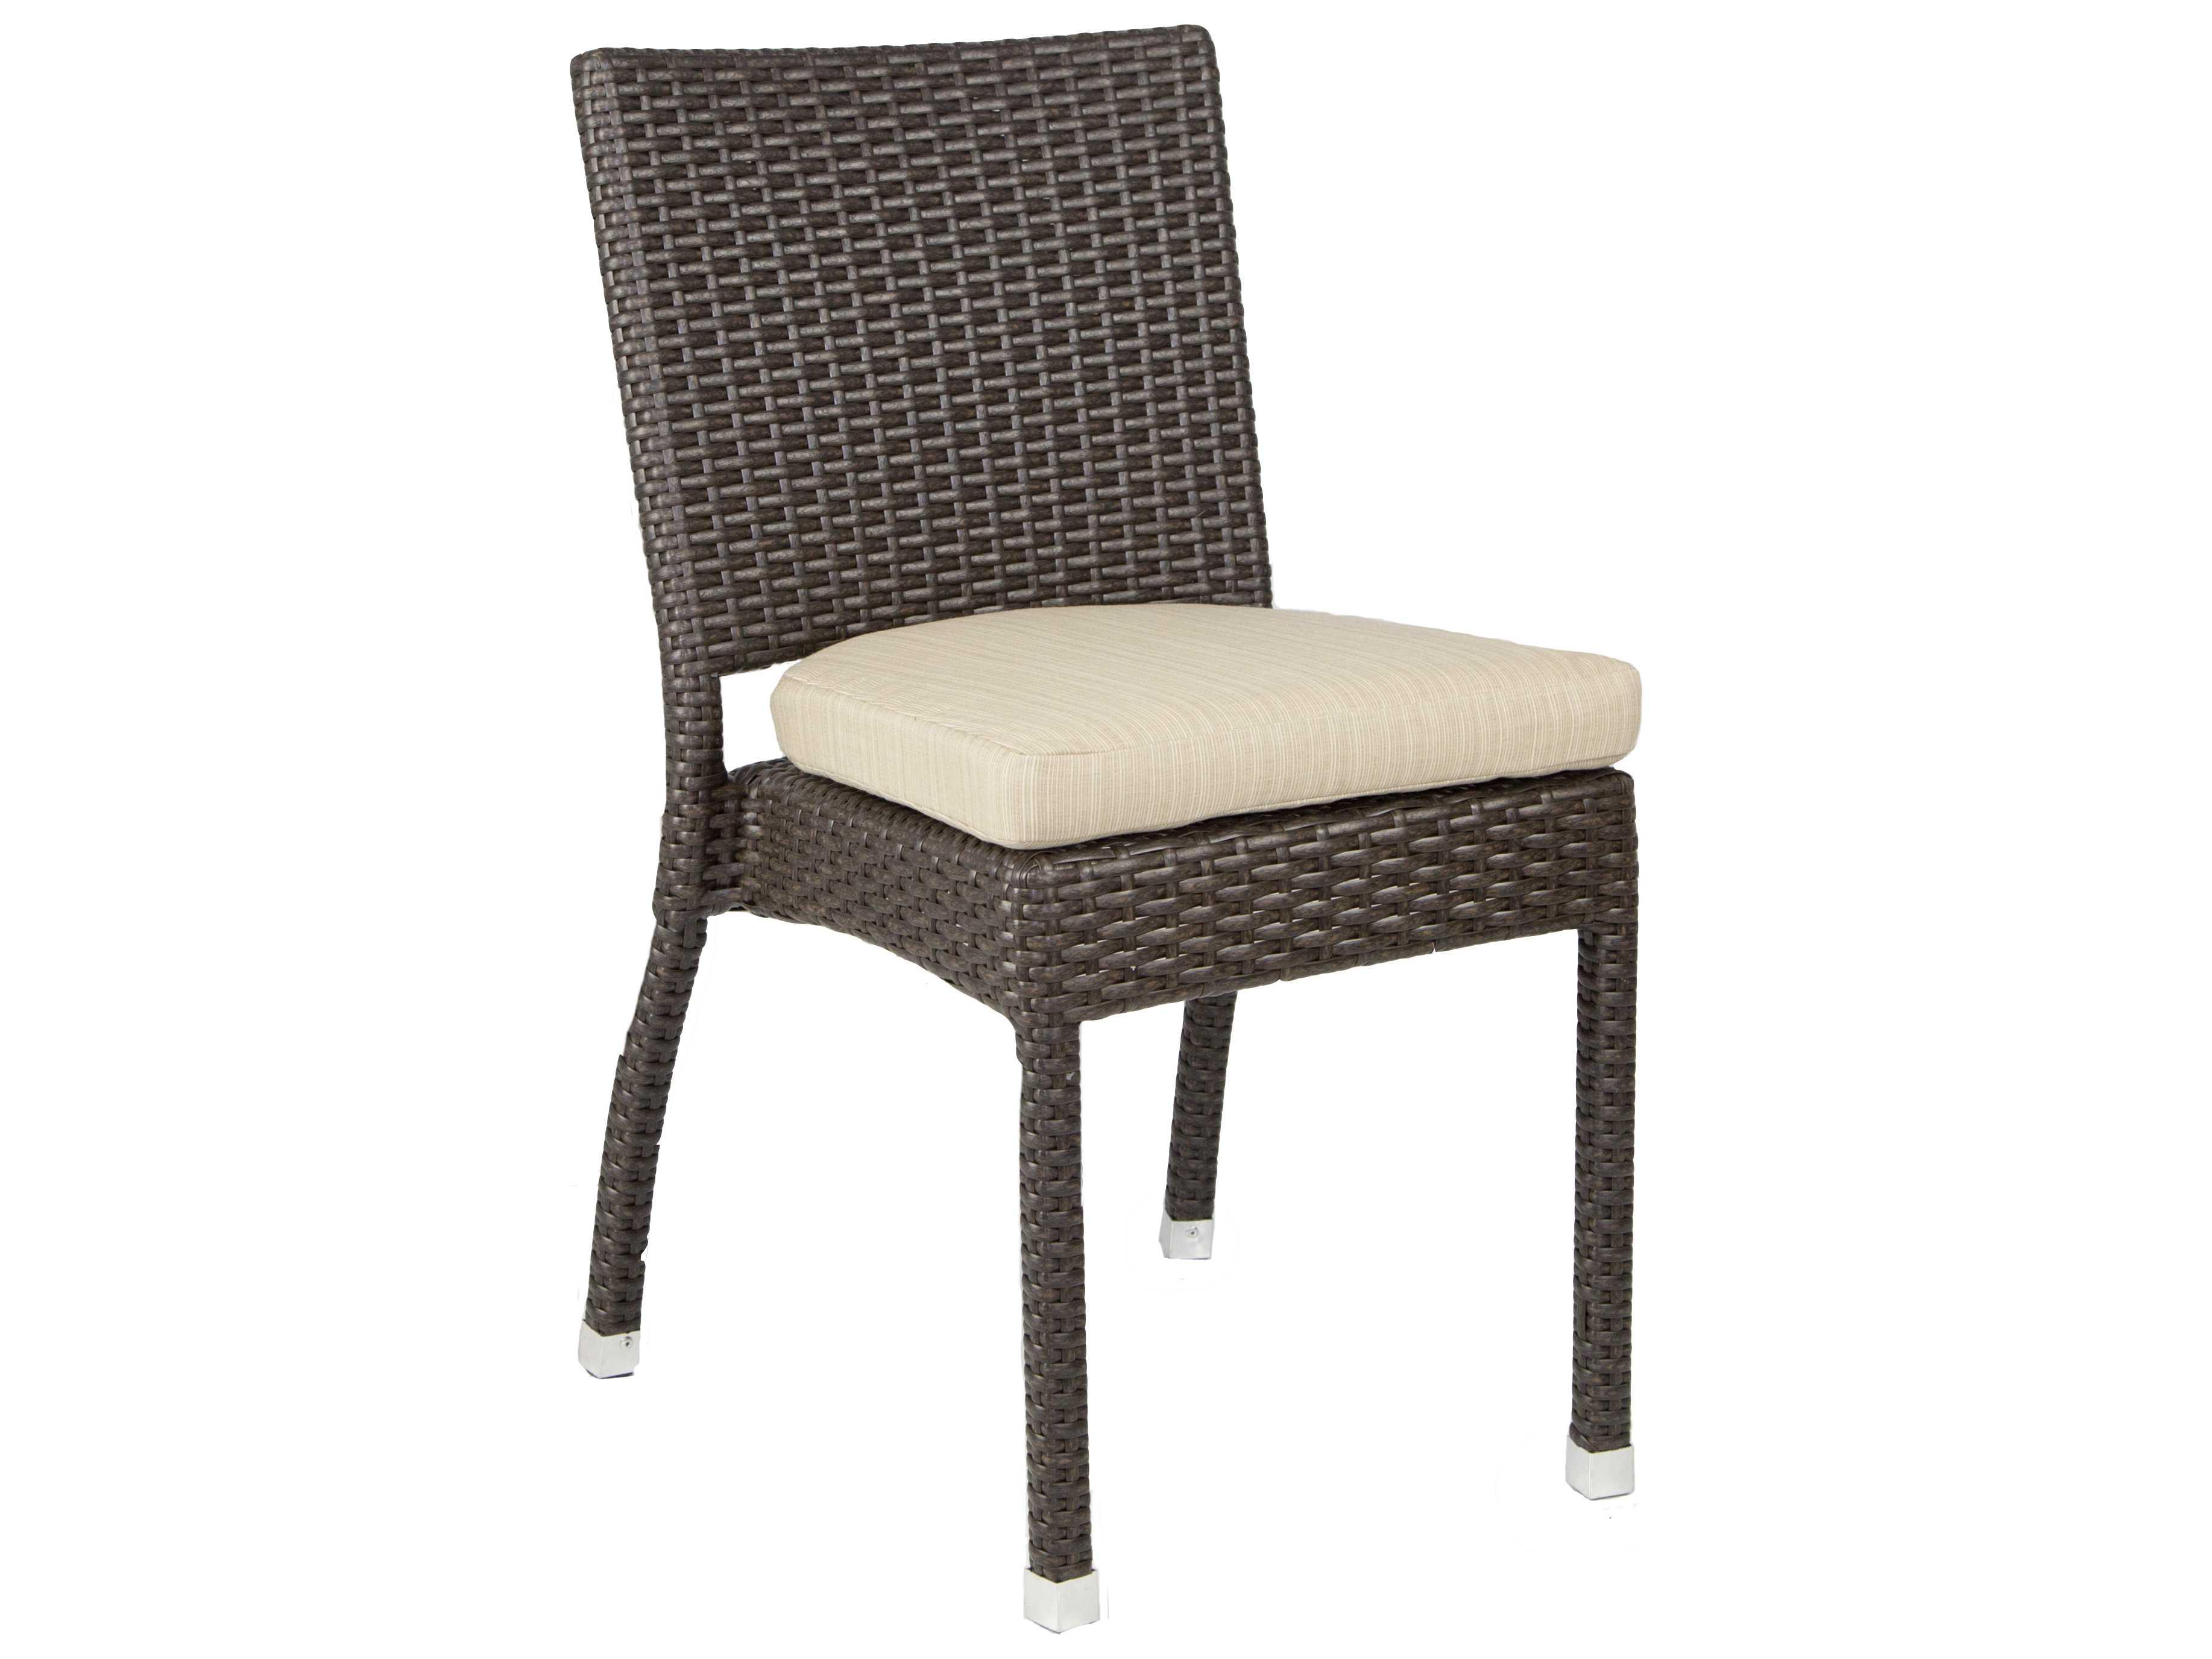 Patio heaven venice zuma wicker side chair paphzsc for Patio heaven